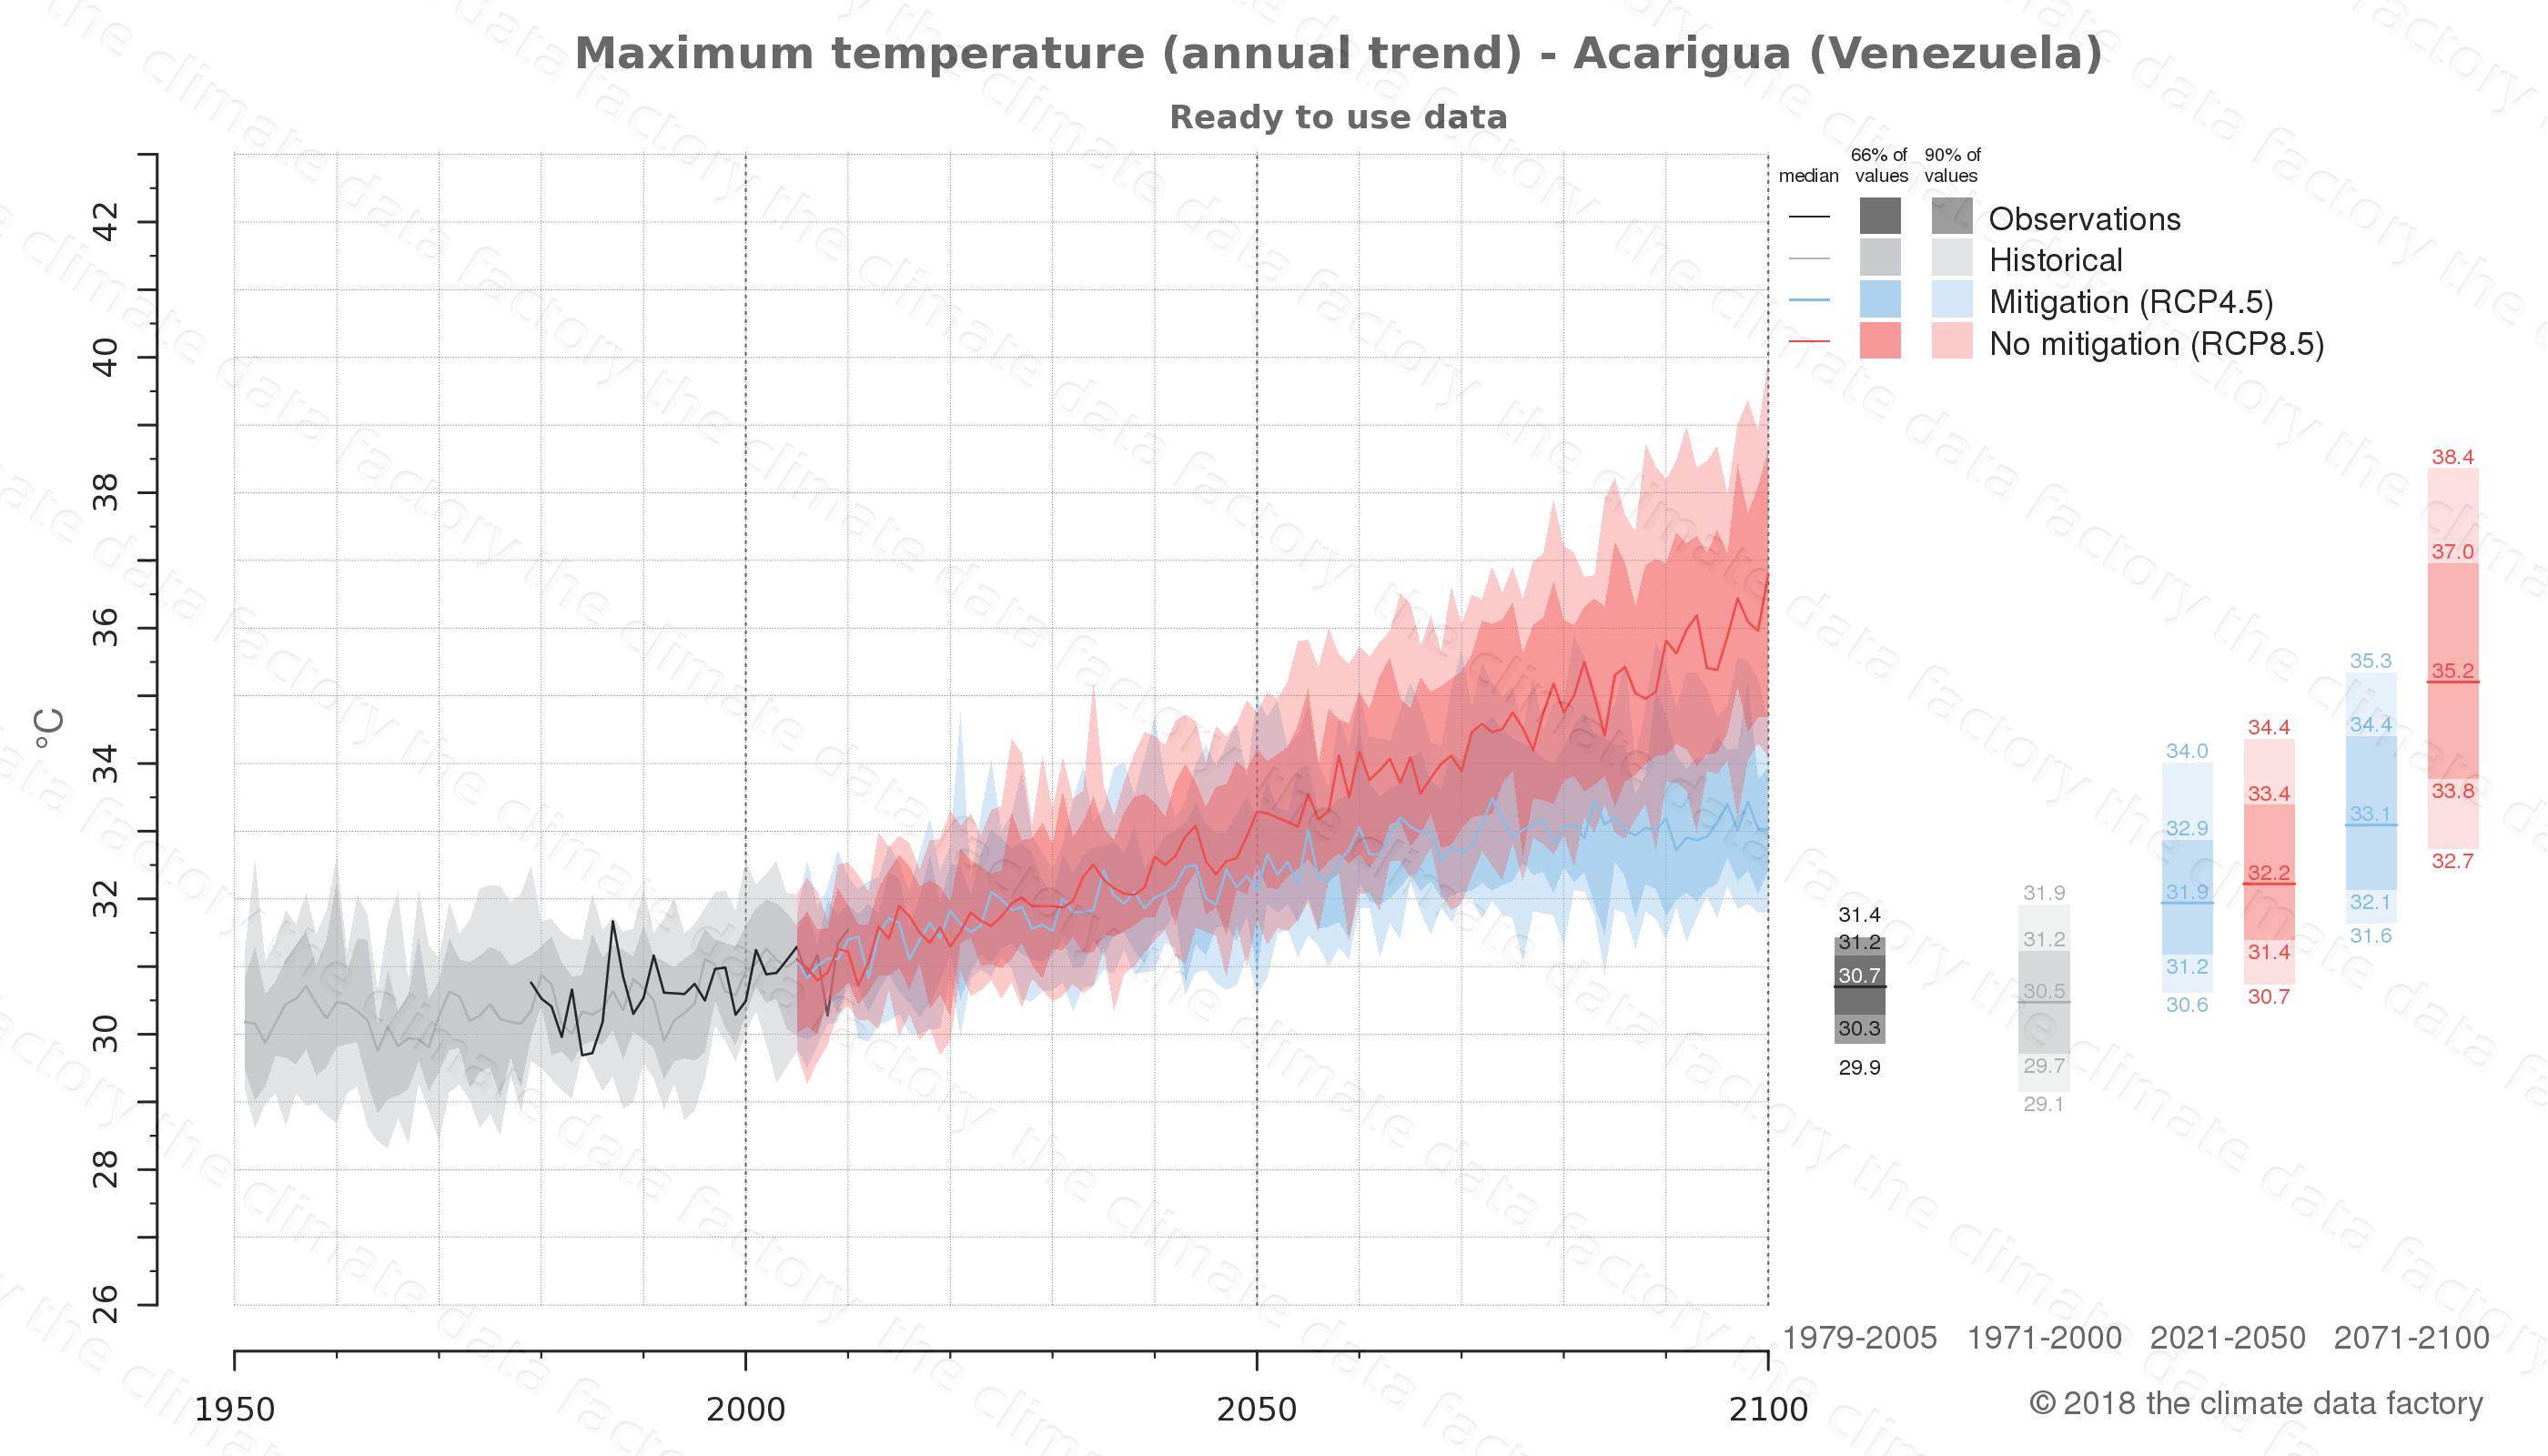 climate change data policy adaptation climate graph city data maximum-temperature acarigua venezuela